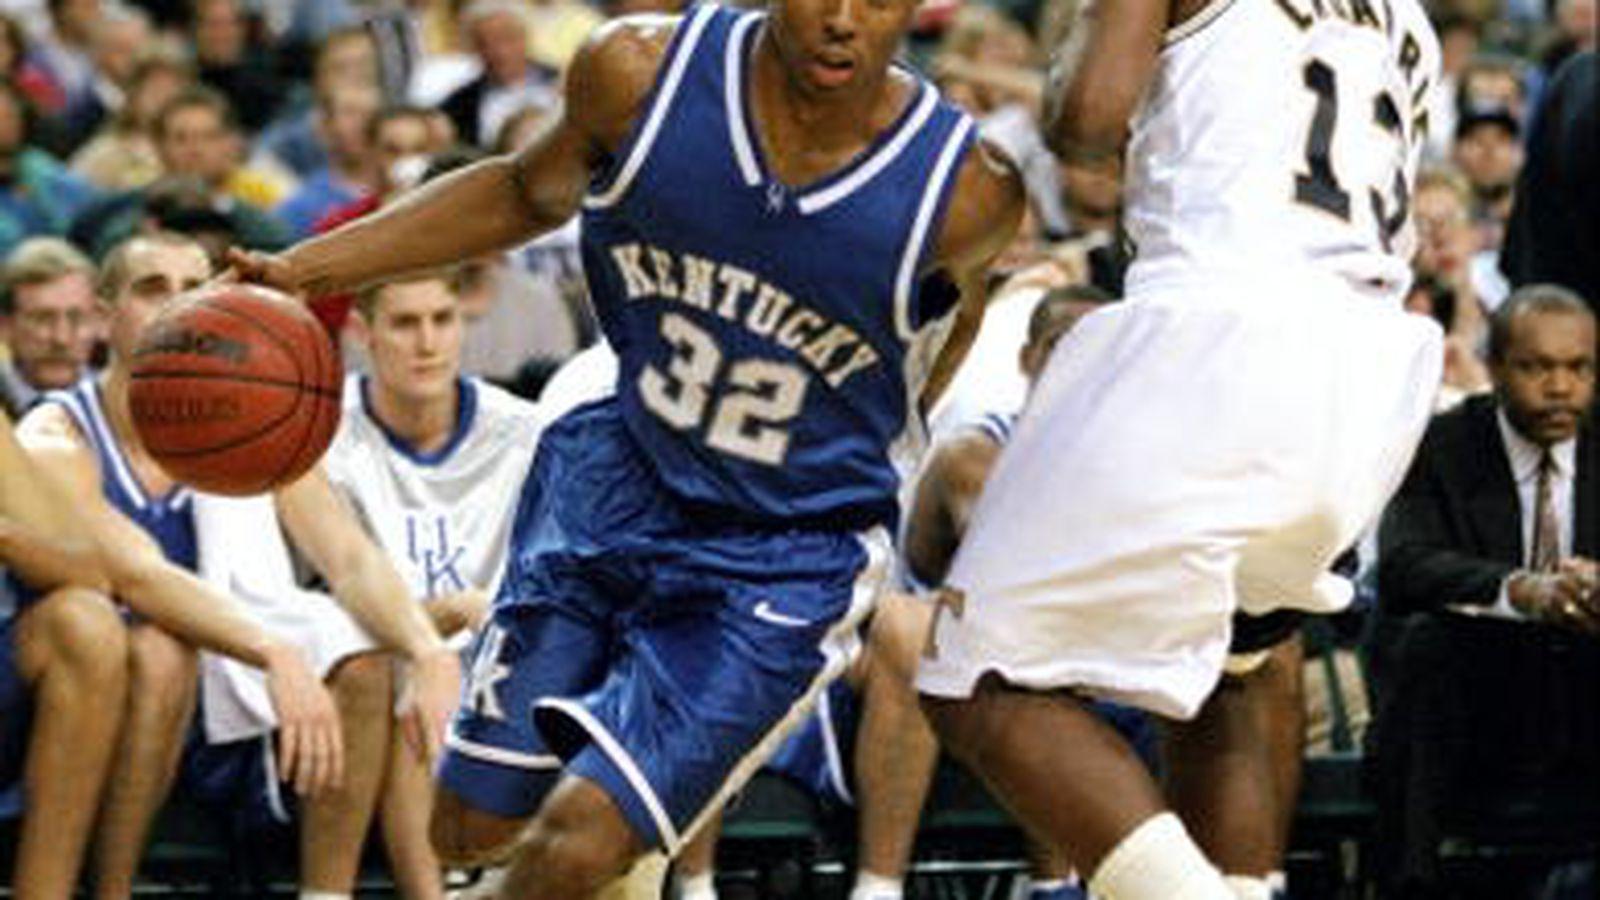 Uk Basketball Players: Desmond Allison Murdered: Former UK Basketball Player Died